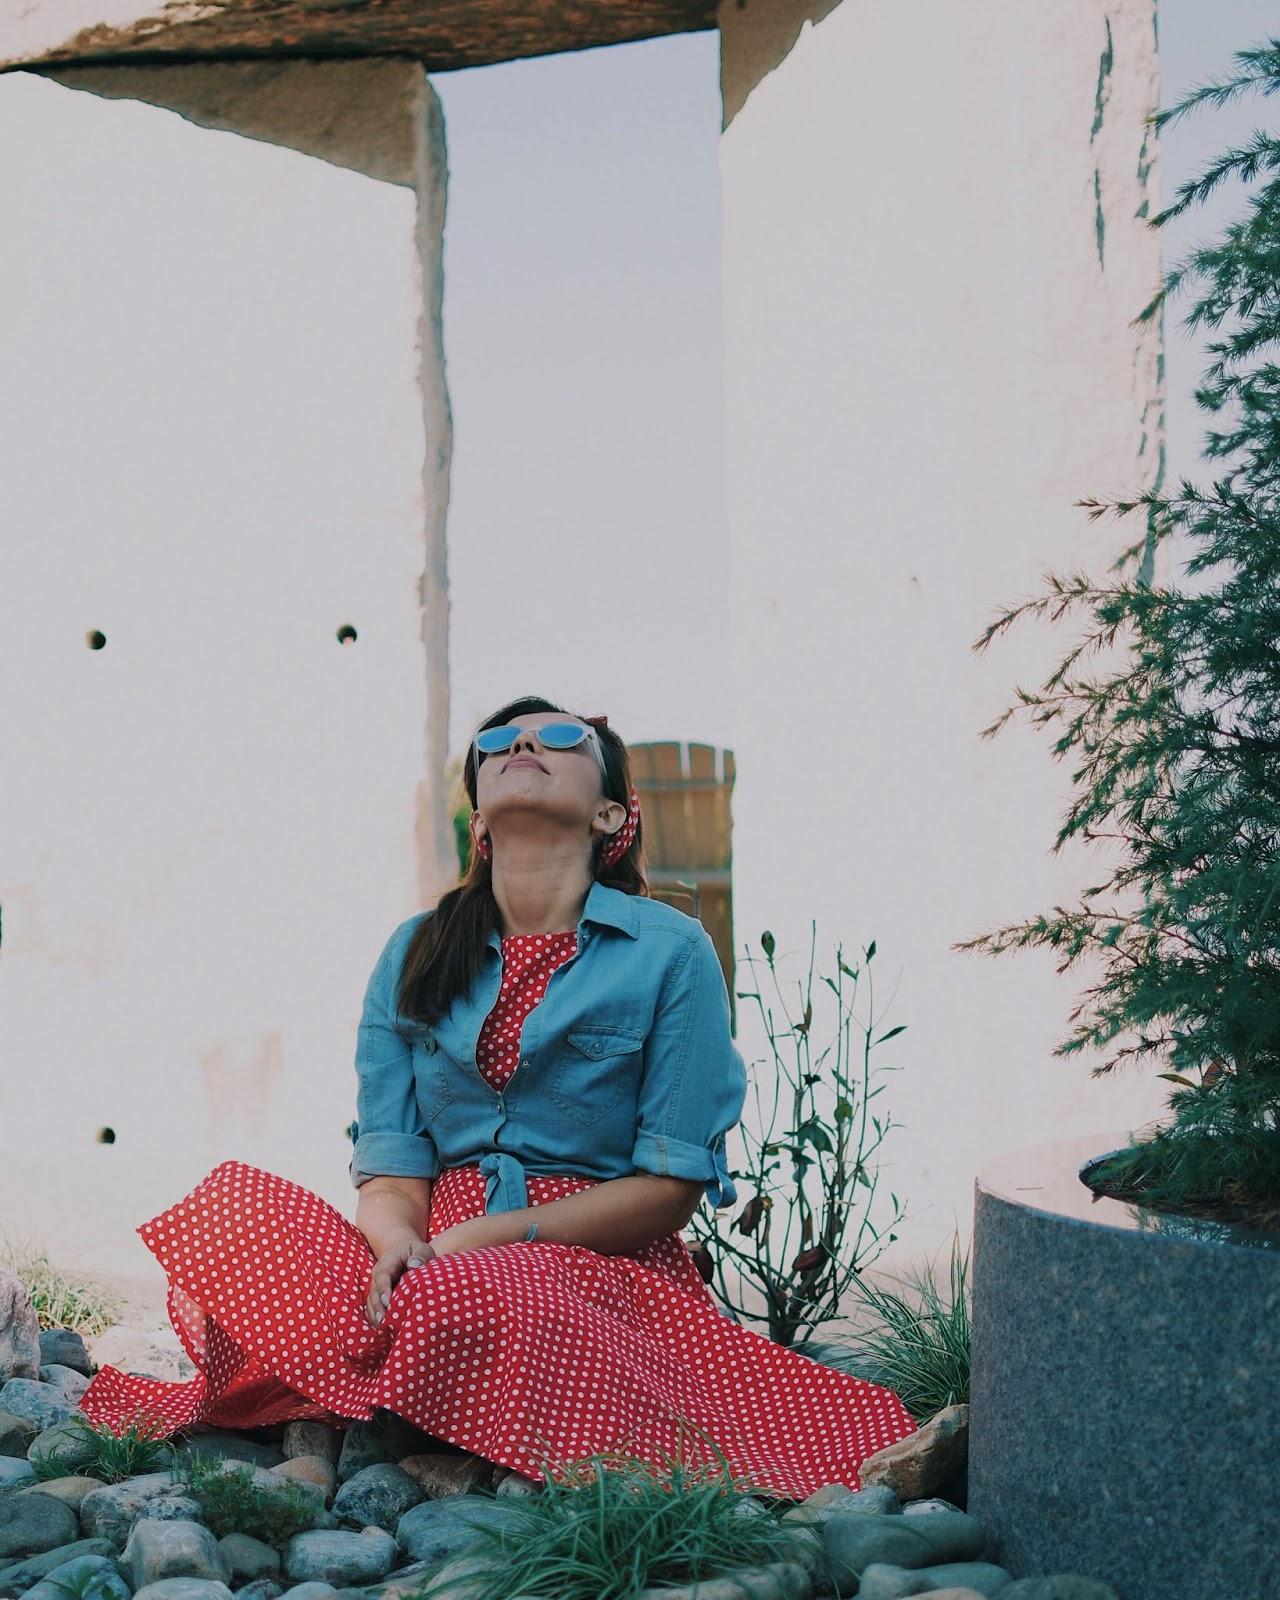 Polka Dots And Denim-mariestilo-ligthinthebox-fashionblogger-dcblogger-itgirl-fashionista-lunares-vestidos-travelblog-mariestilotravels-